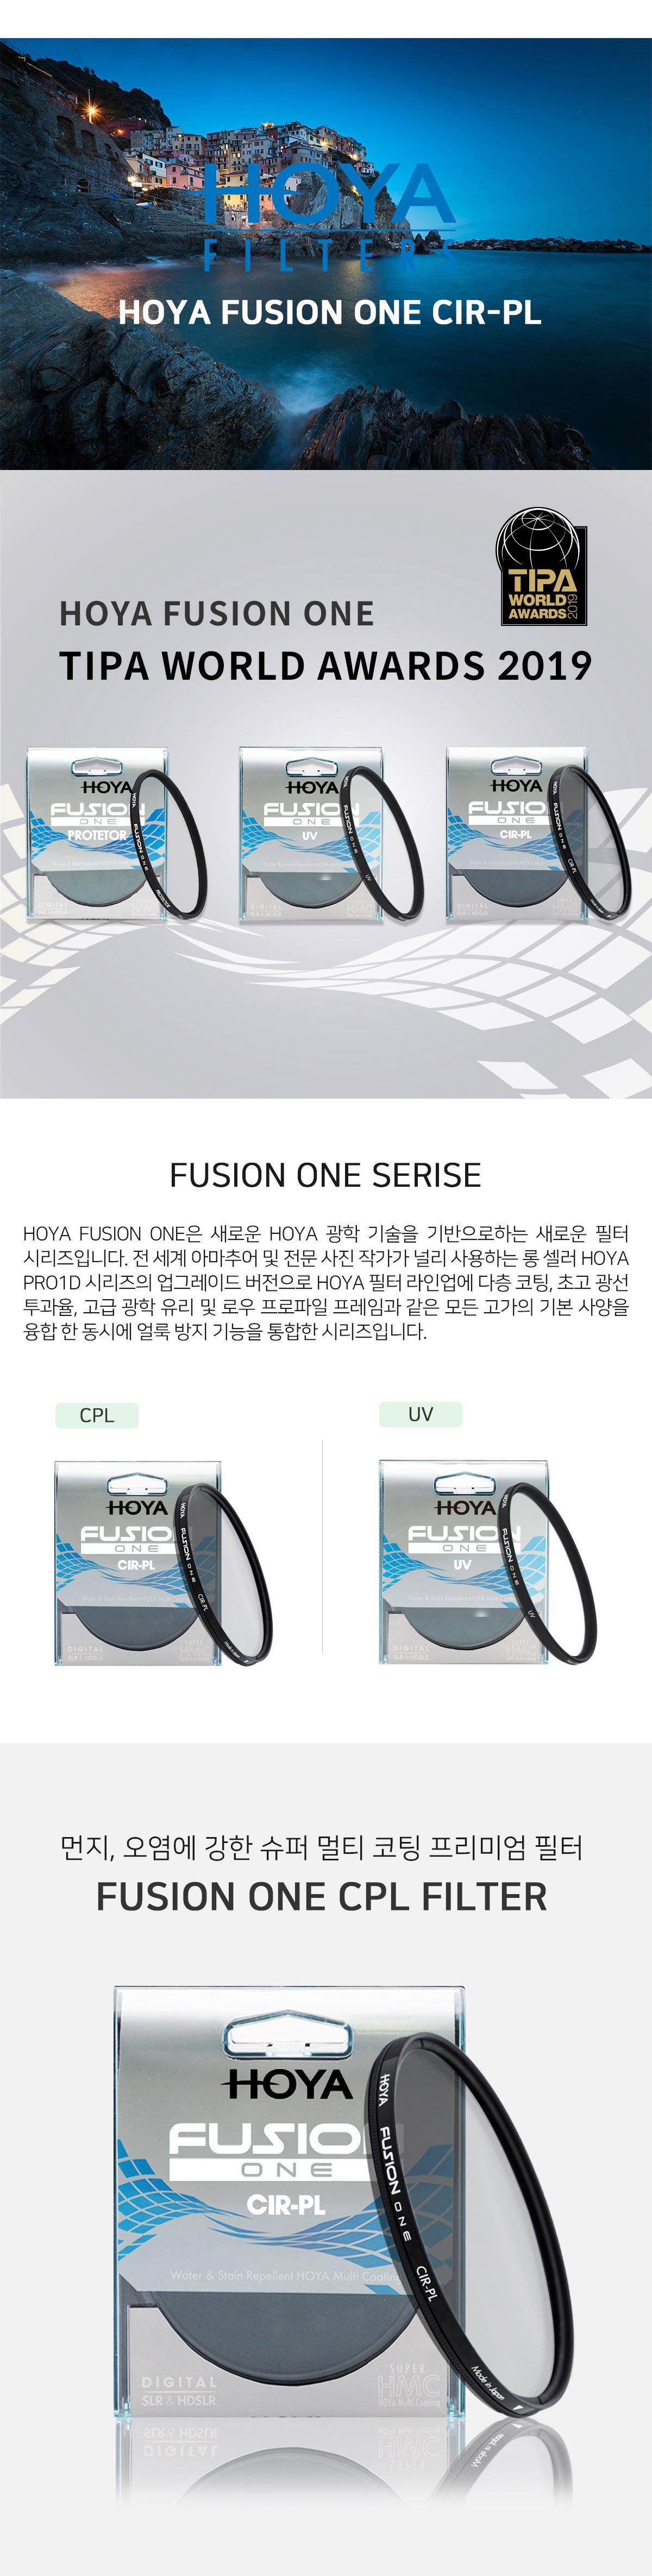 Fusion_One_CPL_01.jpg